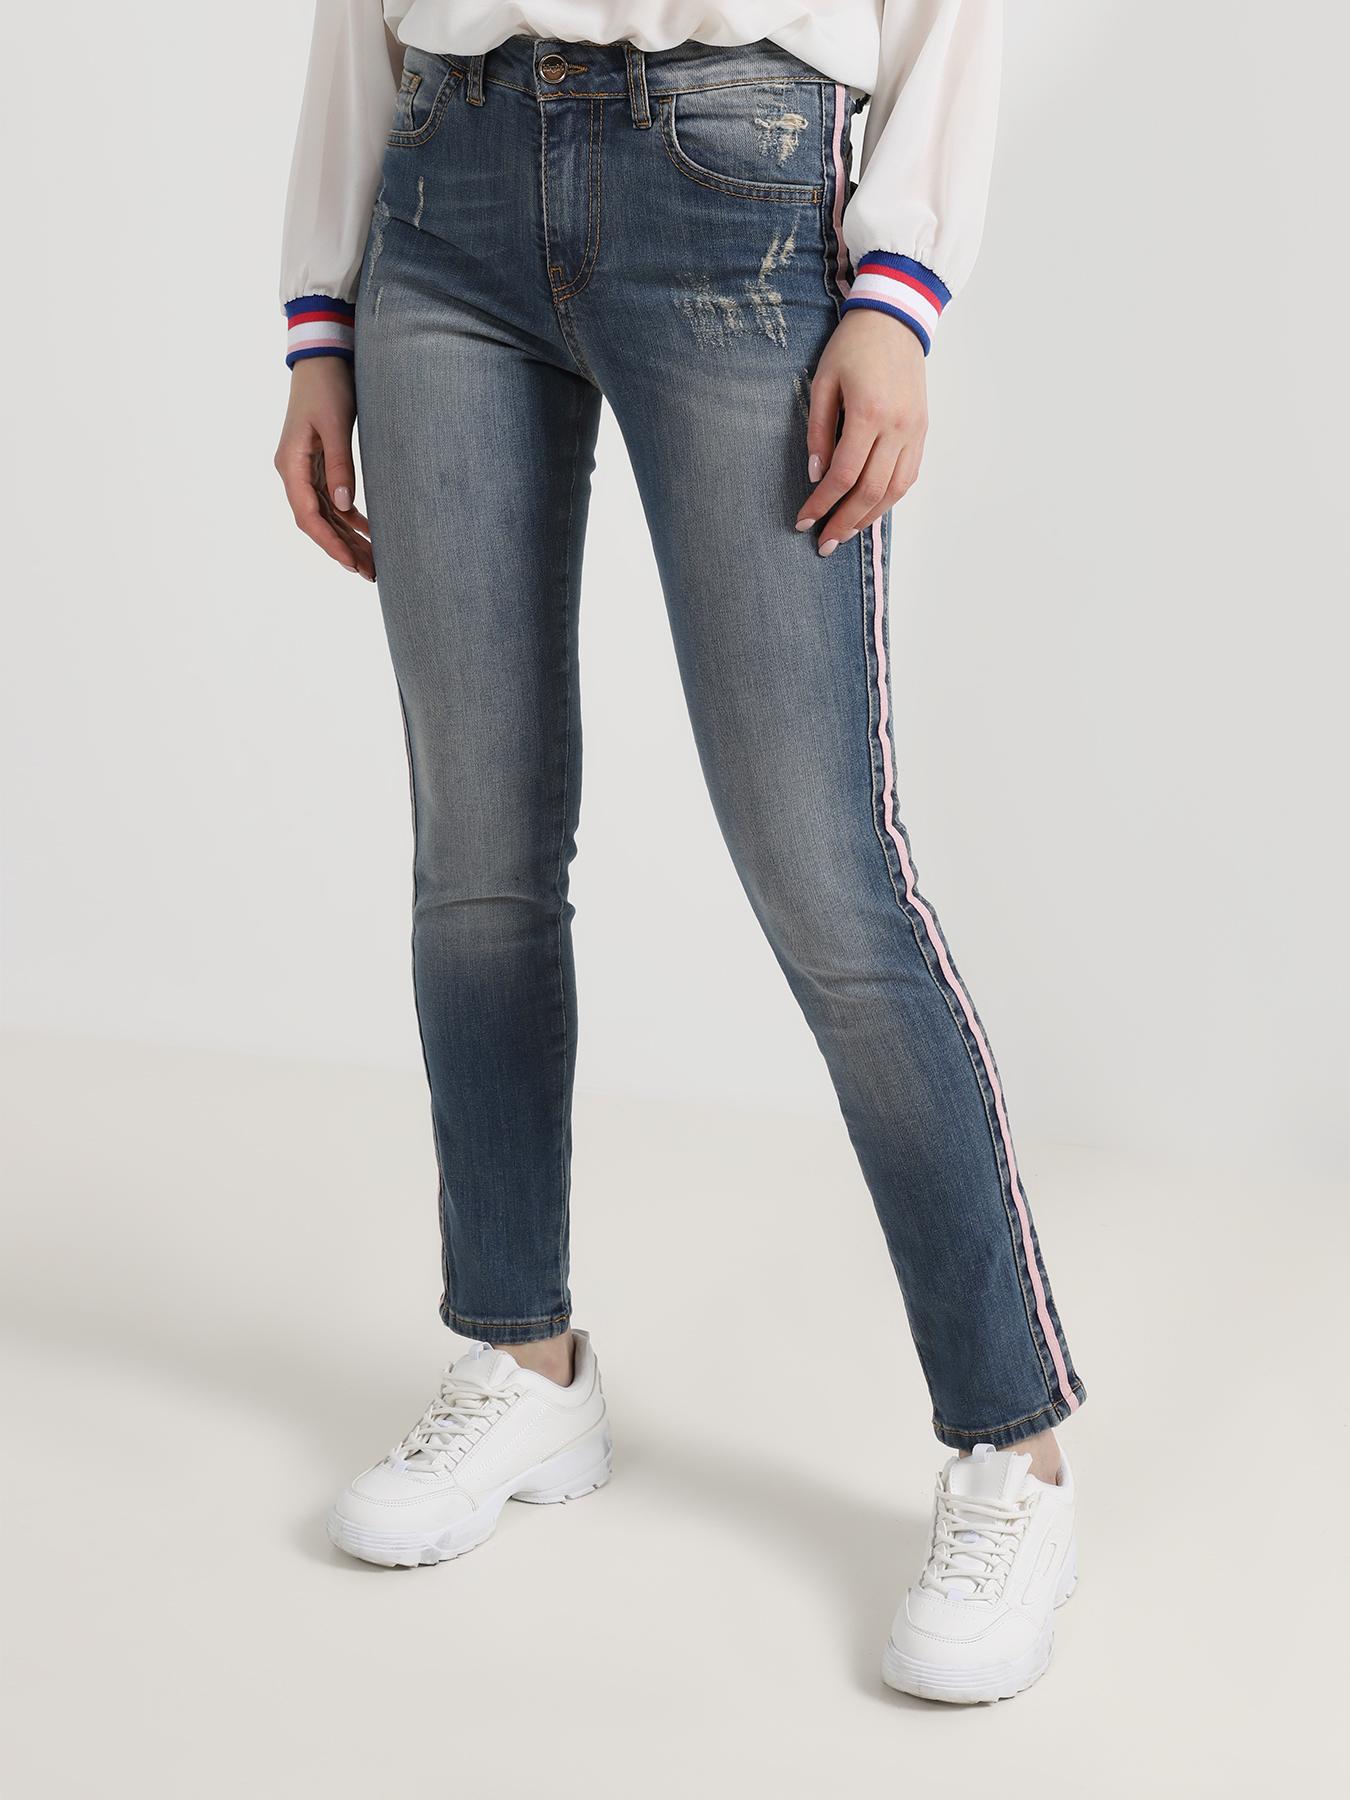 Джинсы Blugirl Джинсы джинсы blugirl джинсы в стиле брюк